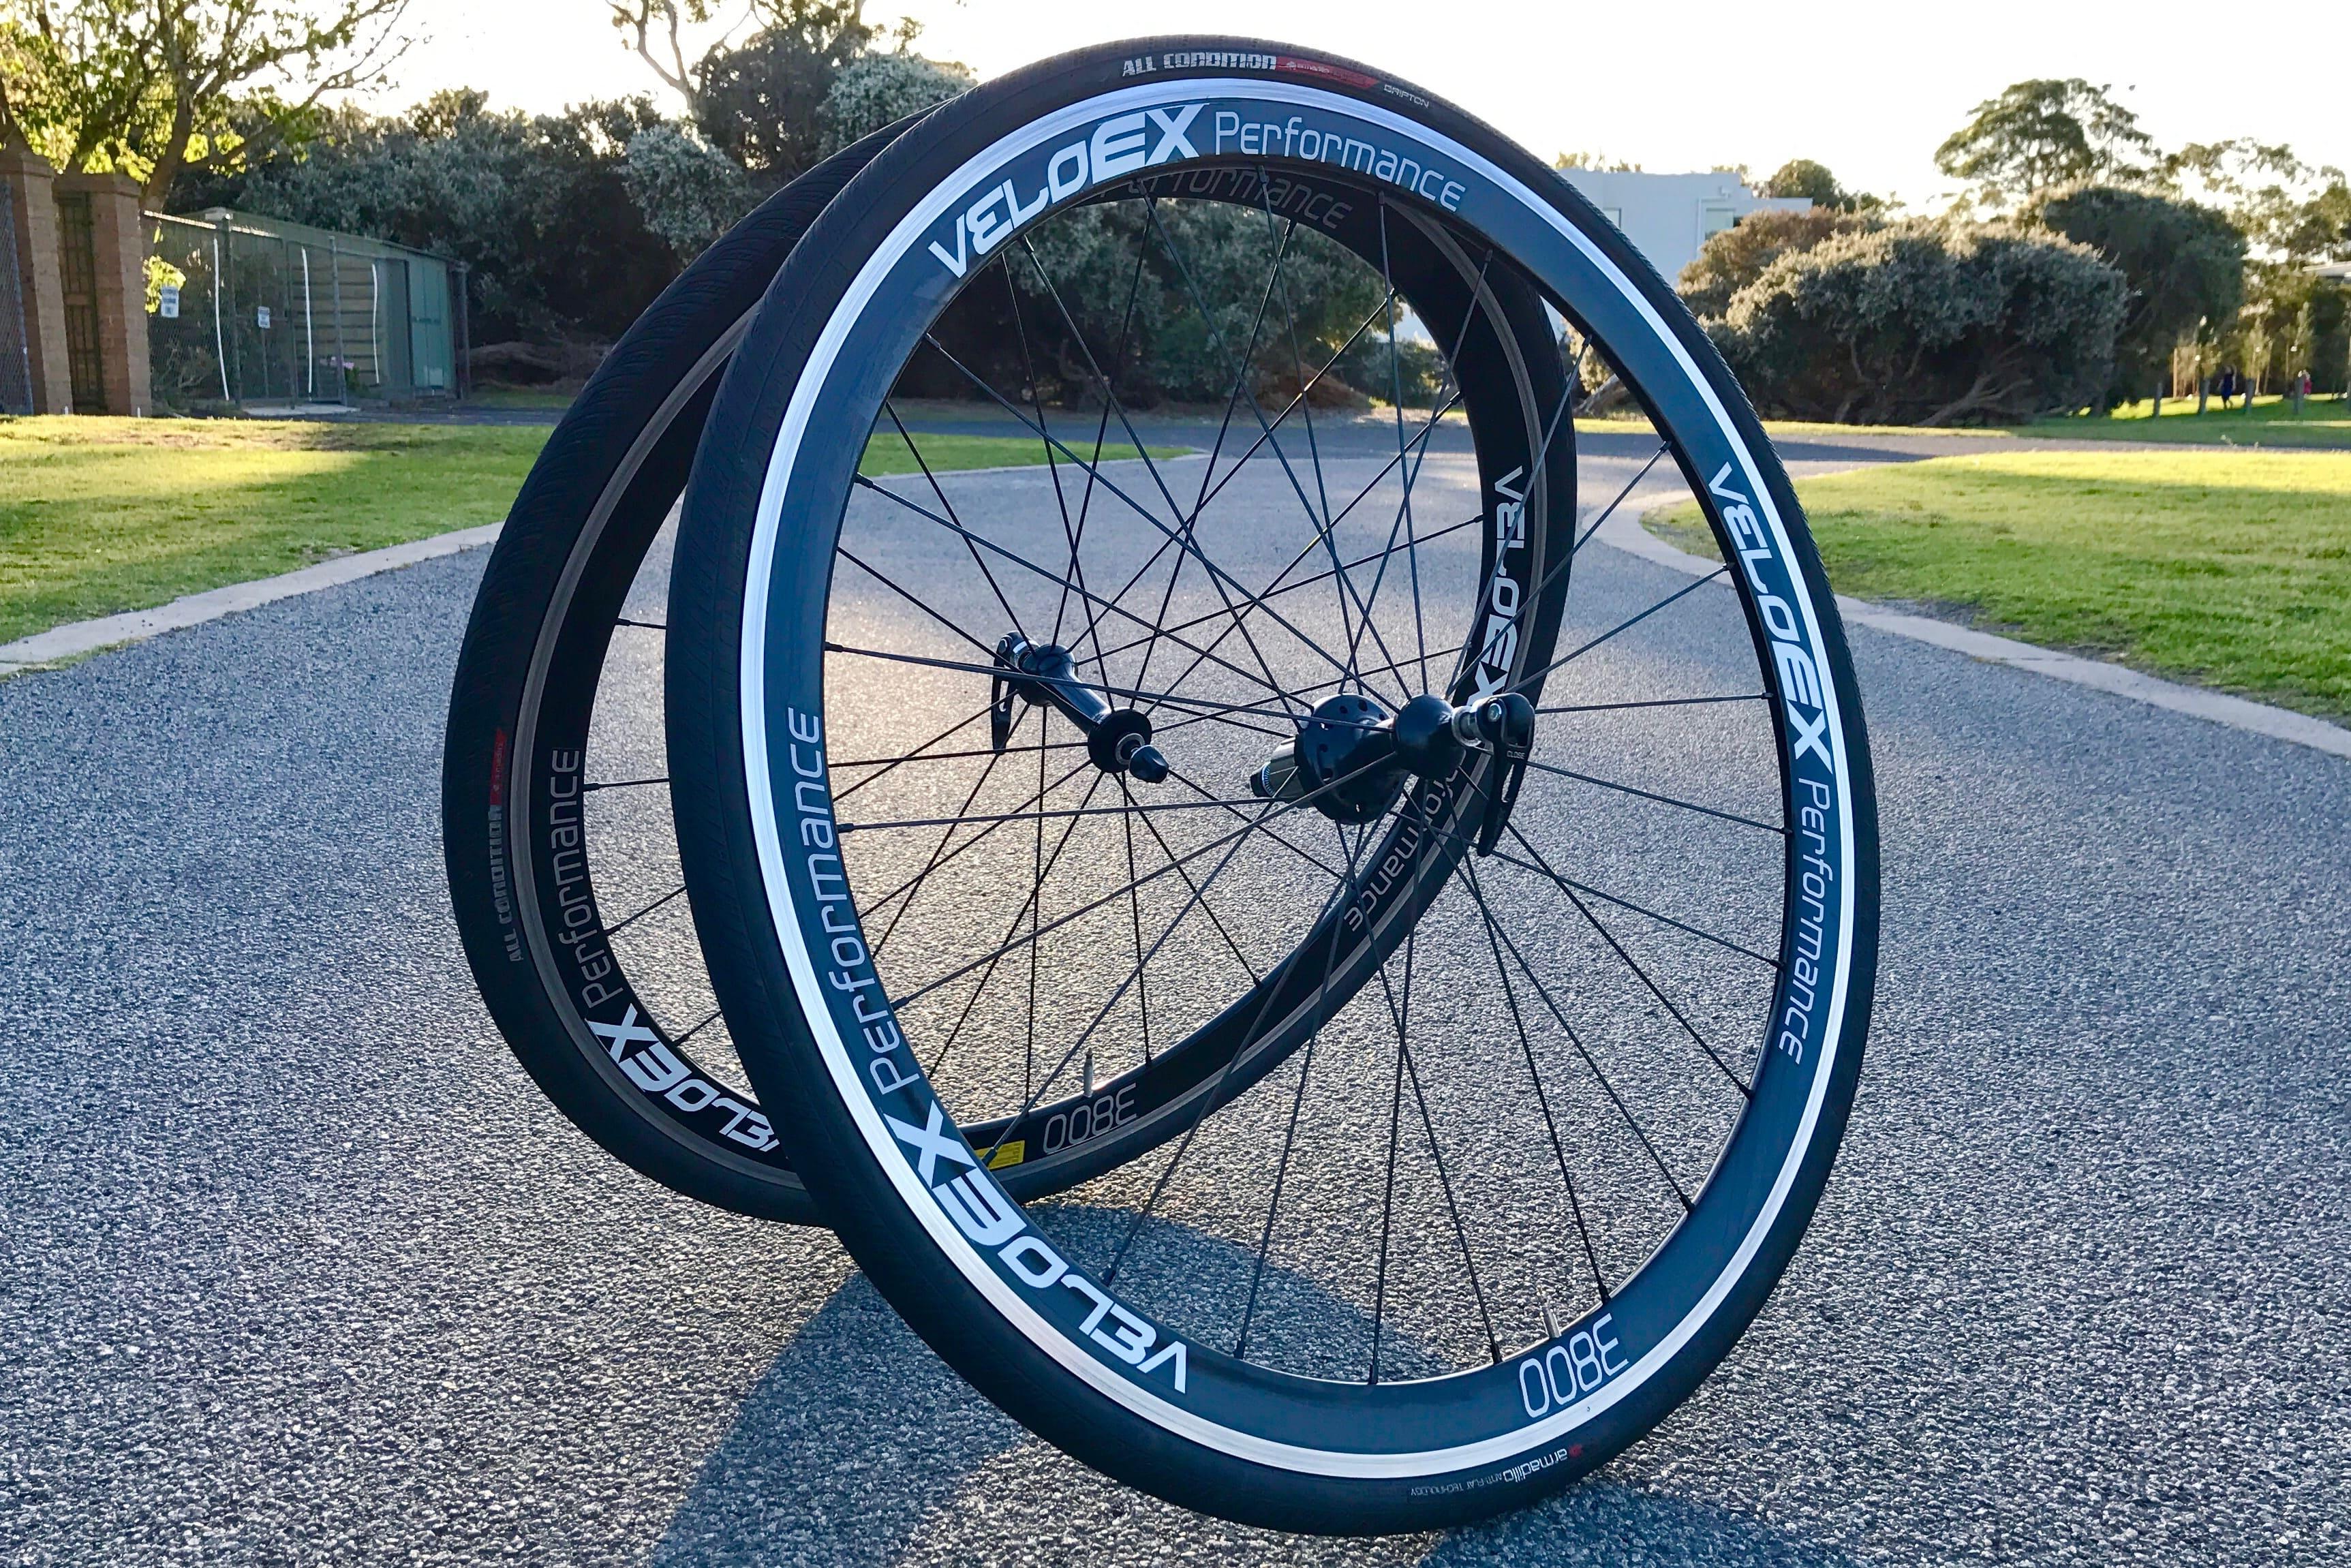 Veloex road wheel review